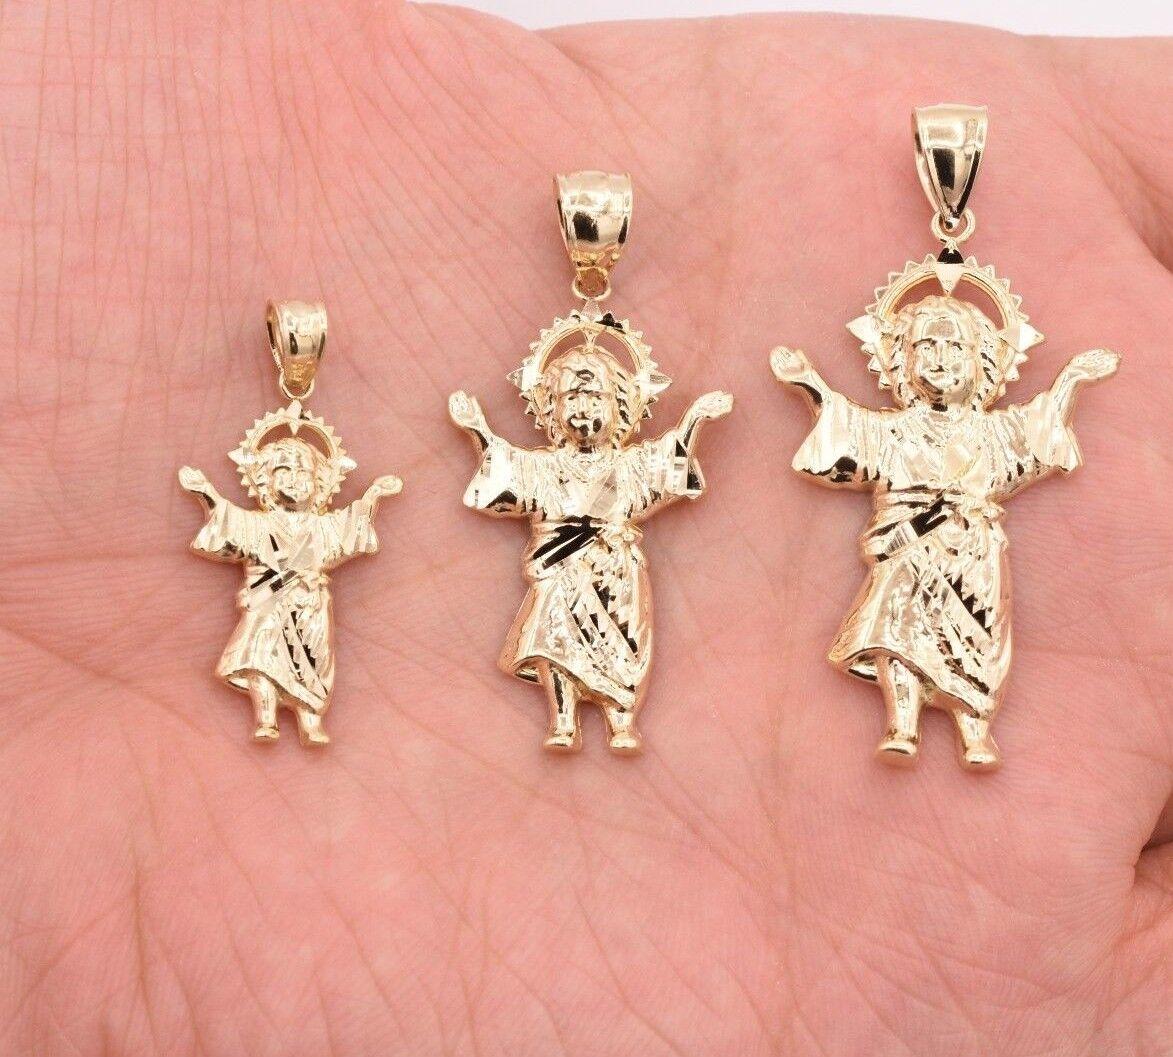 Divino Nino Baby Jesus Religious Diamond Cut Charm Pendant Solid 10K Yellow gold